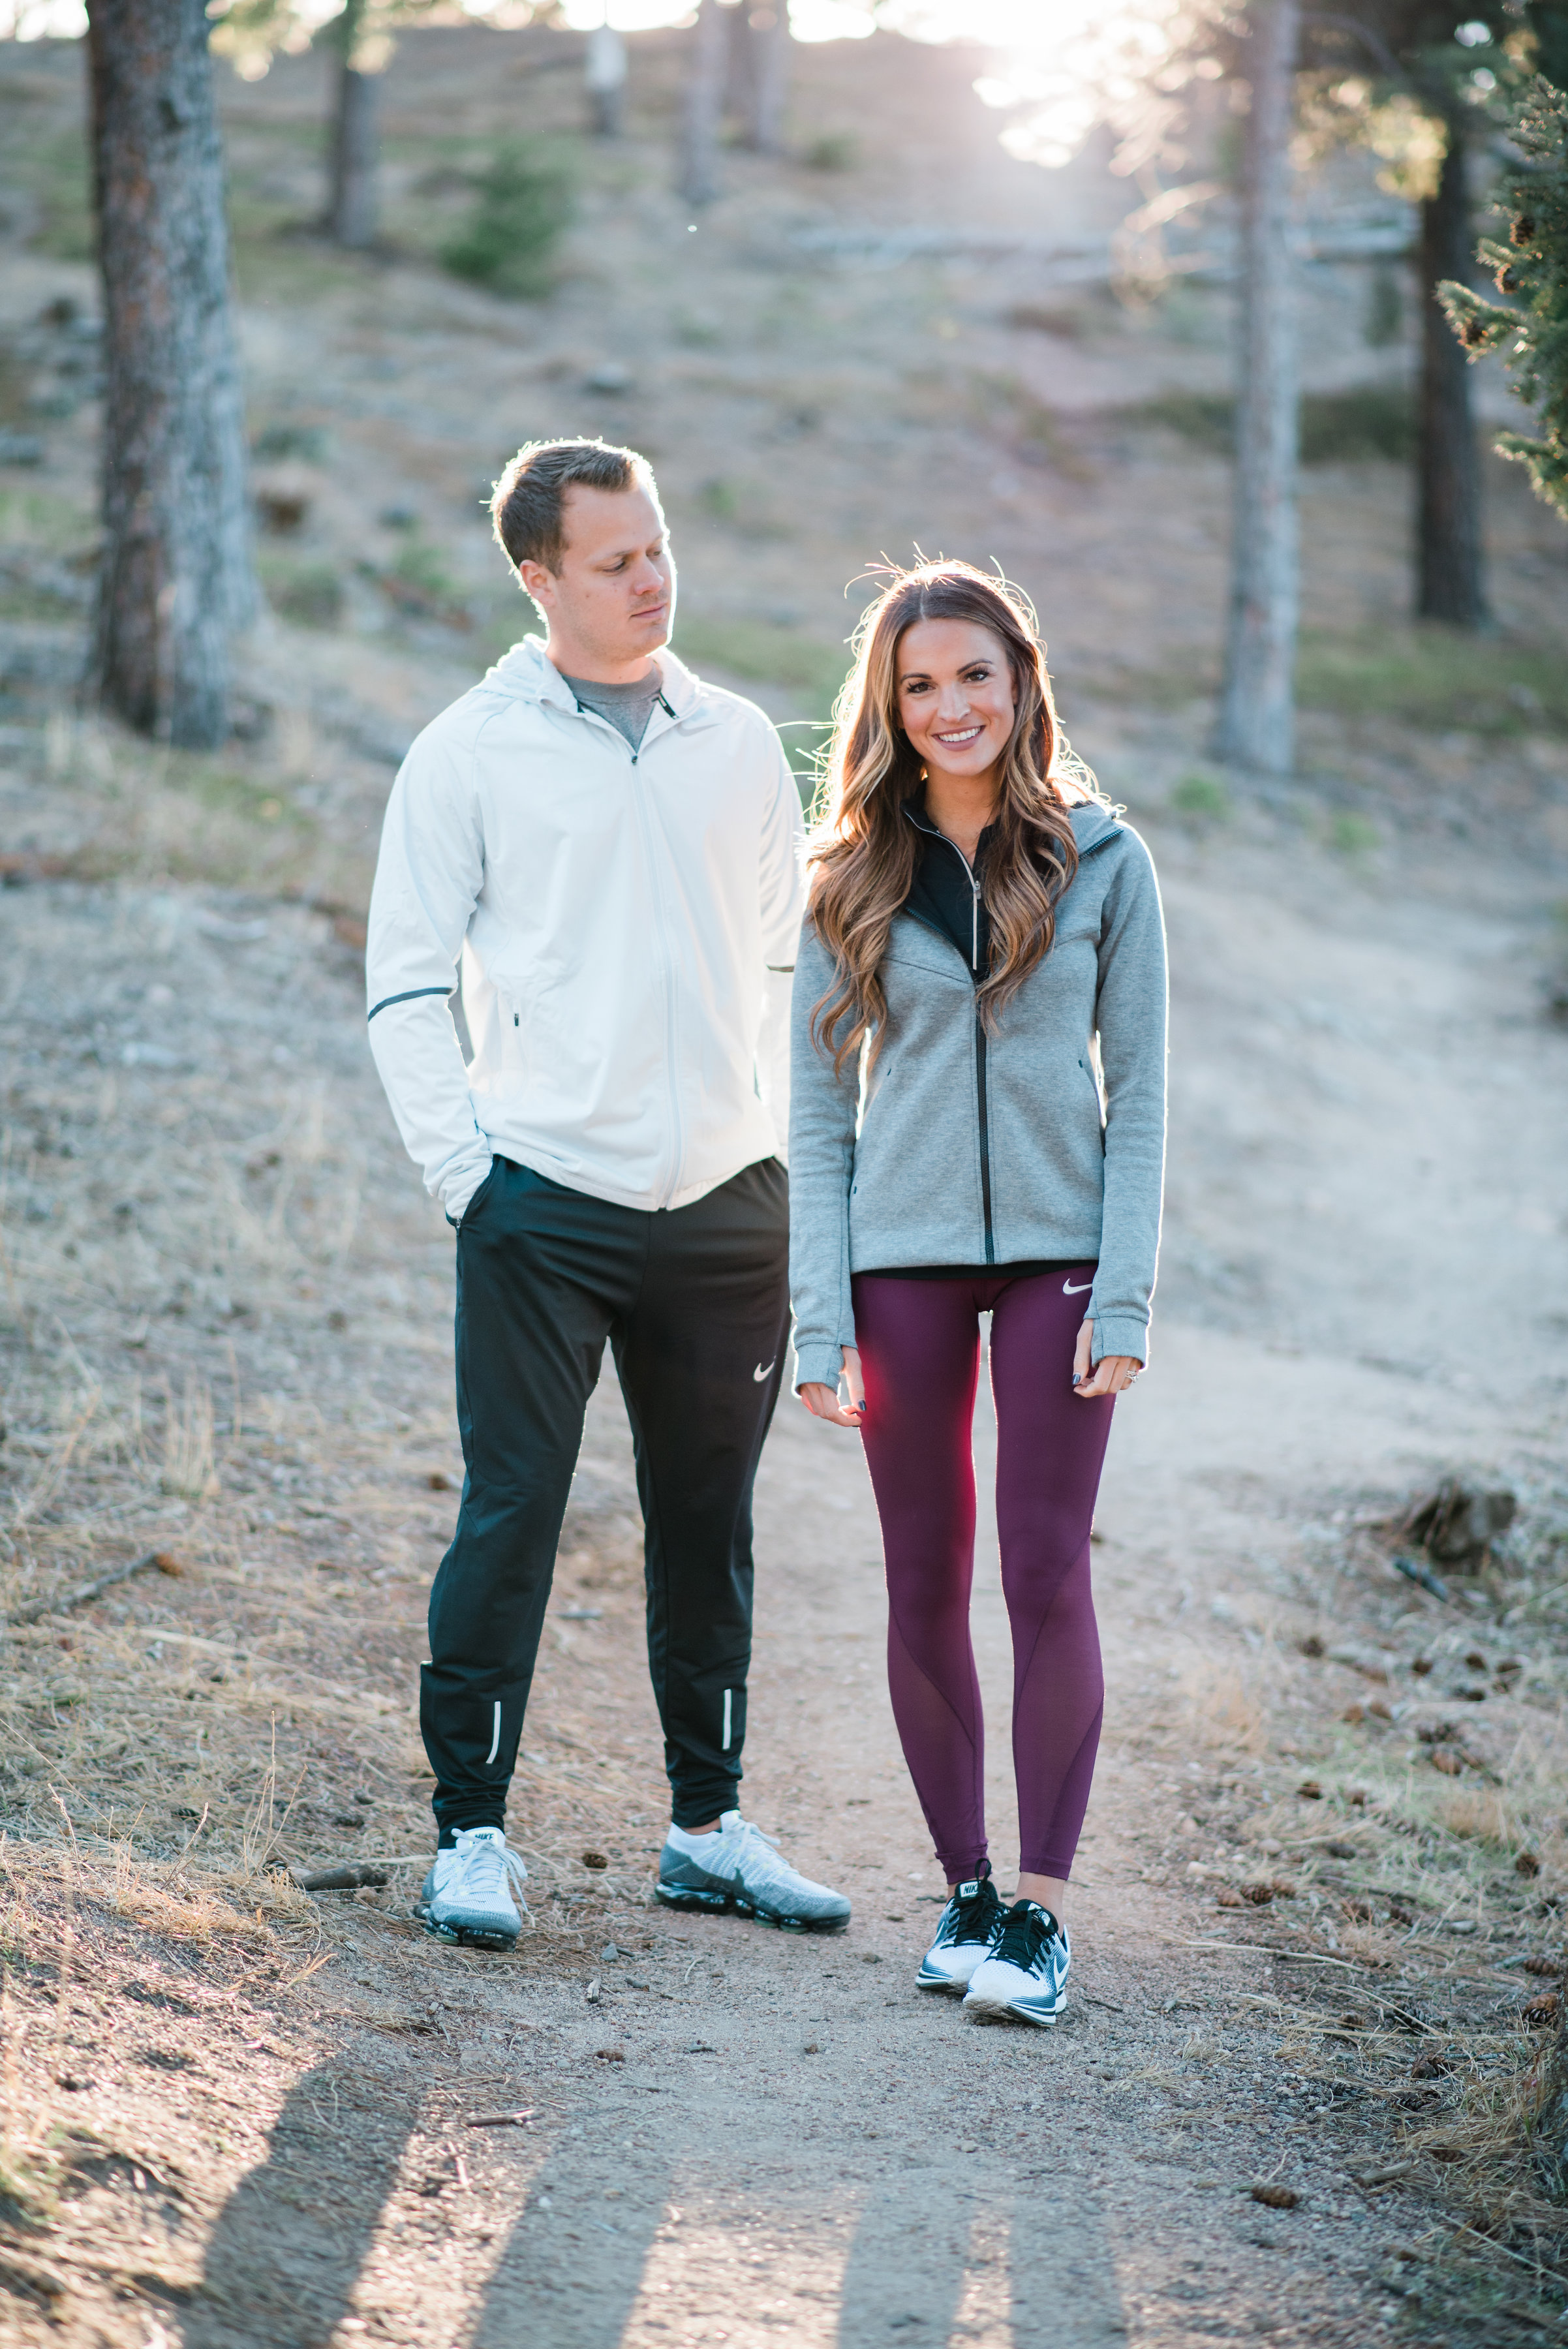 lauren sims athletic gift ideas